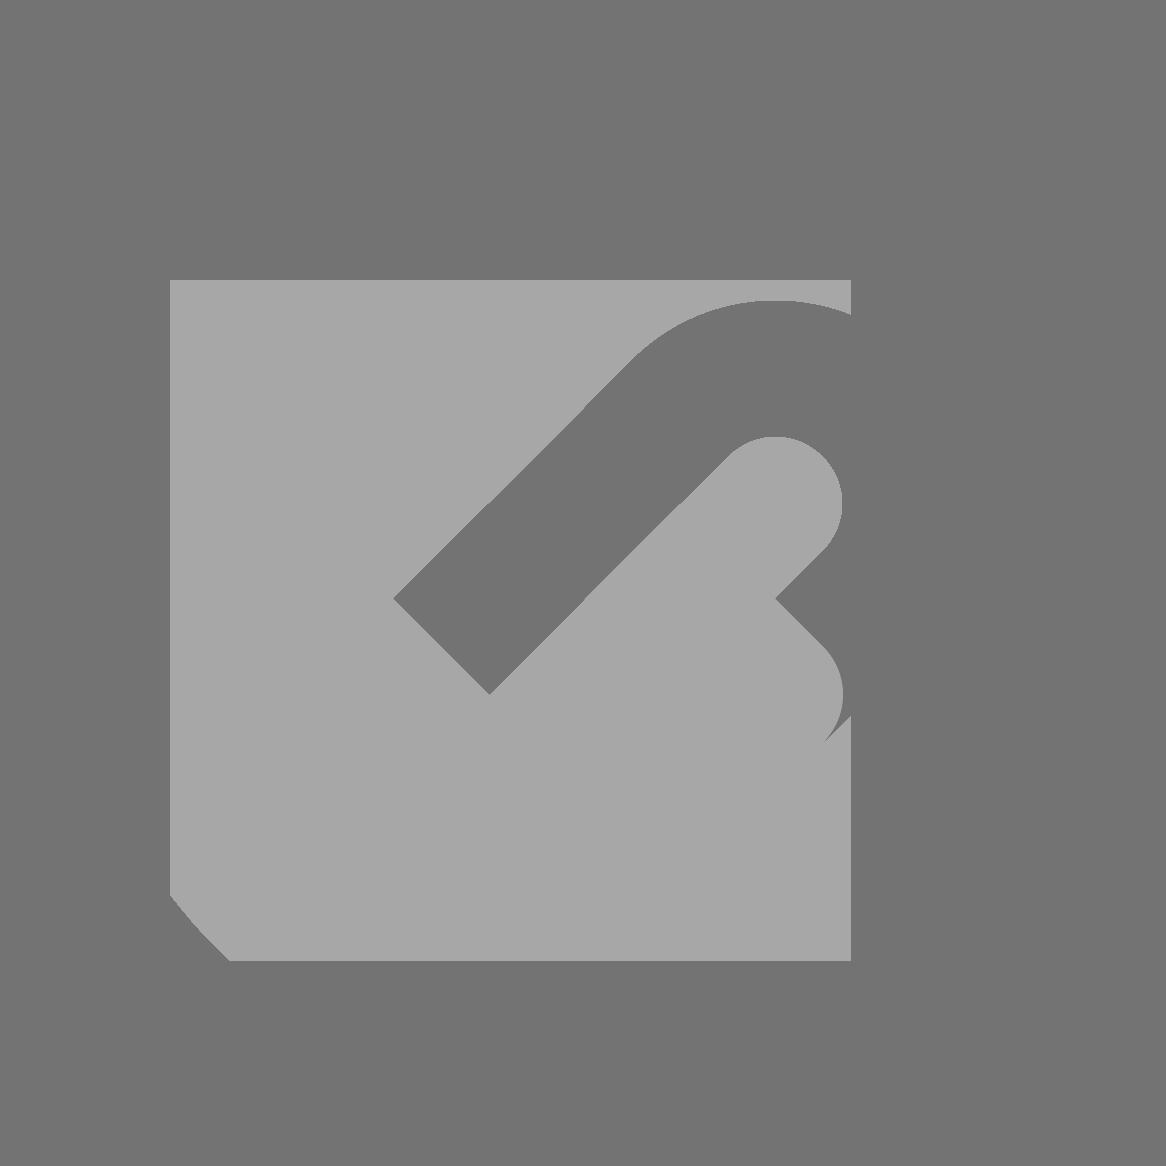 Logo #3 - lined